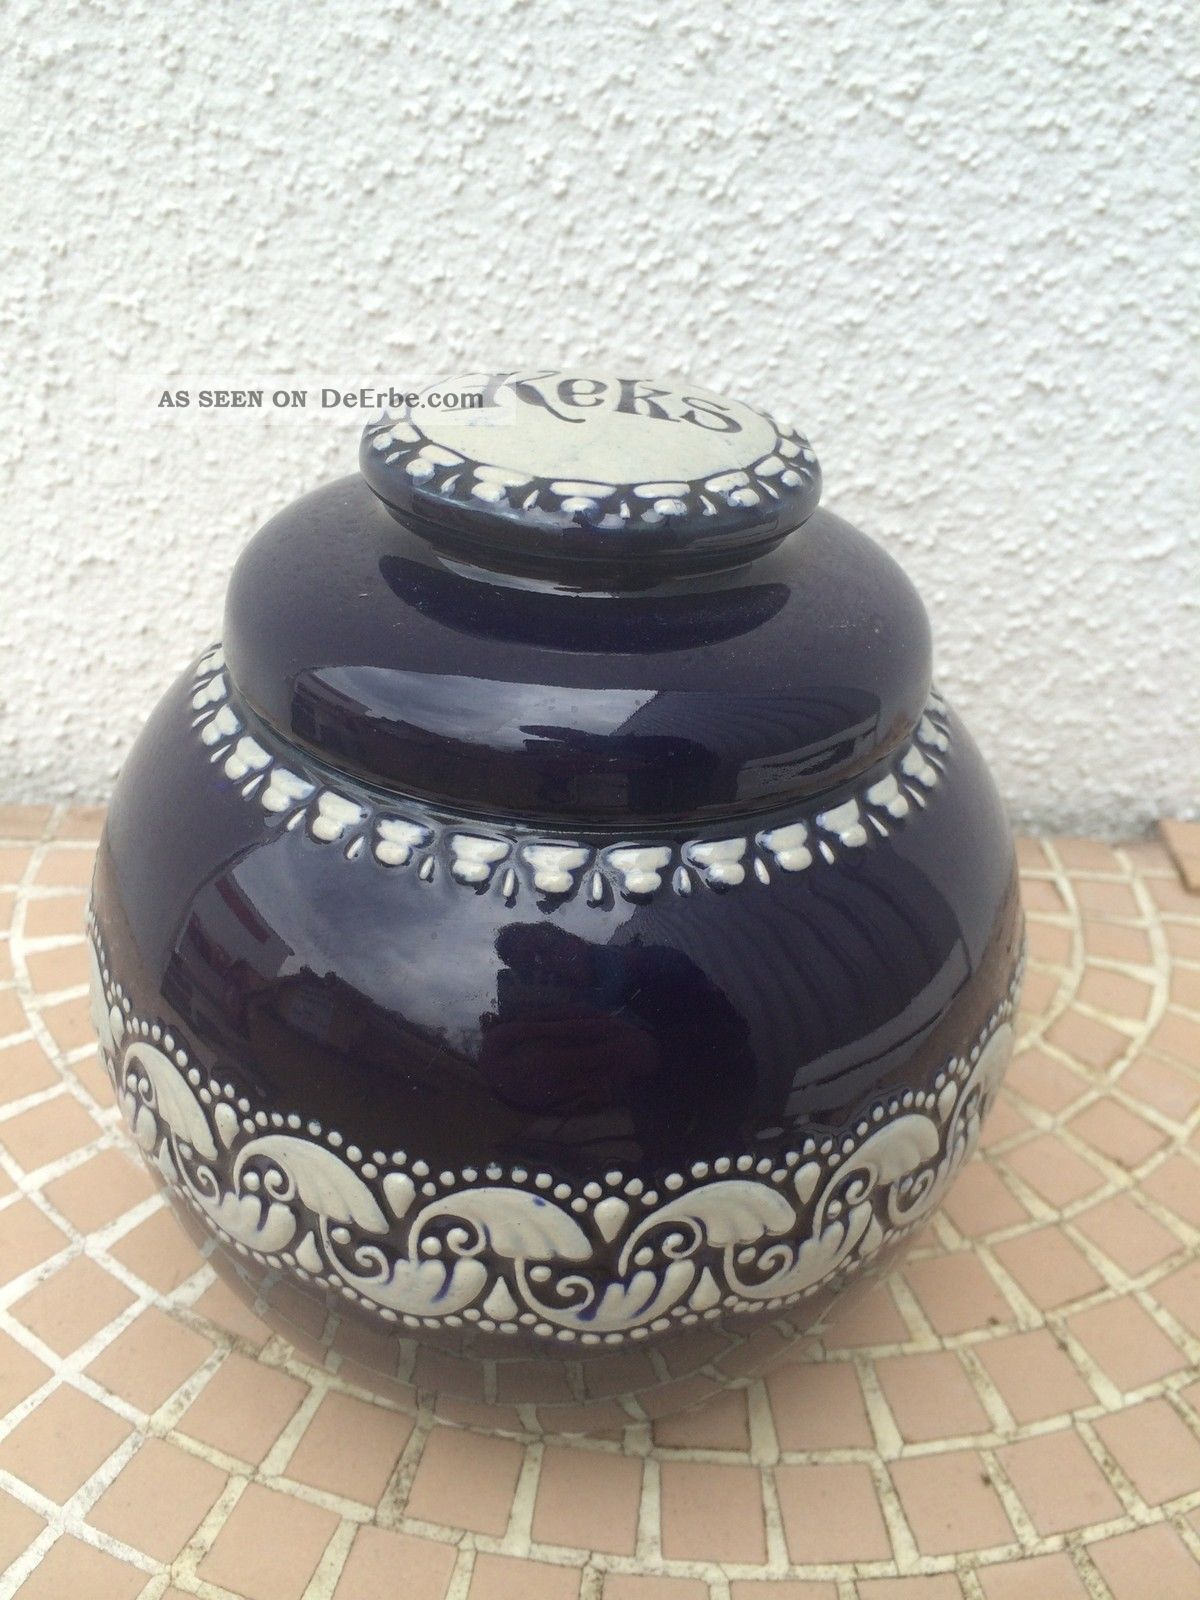 alte keramikdose f r kekse mit deckel sch ne handarbeit. Black Bedroom Furniture Sets. Home Design Ideas